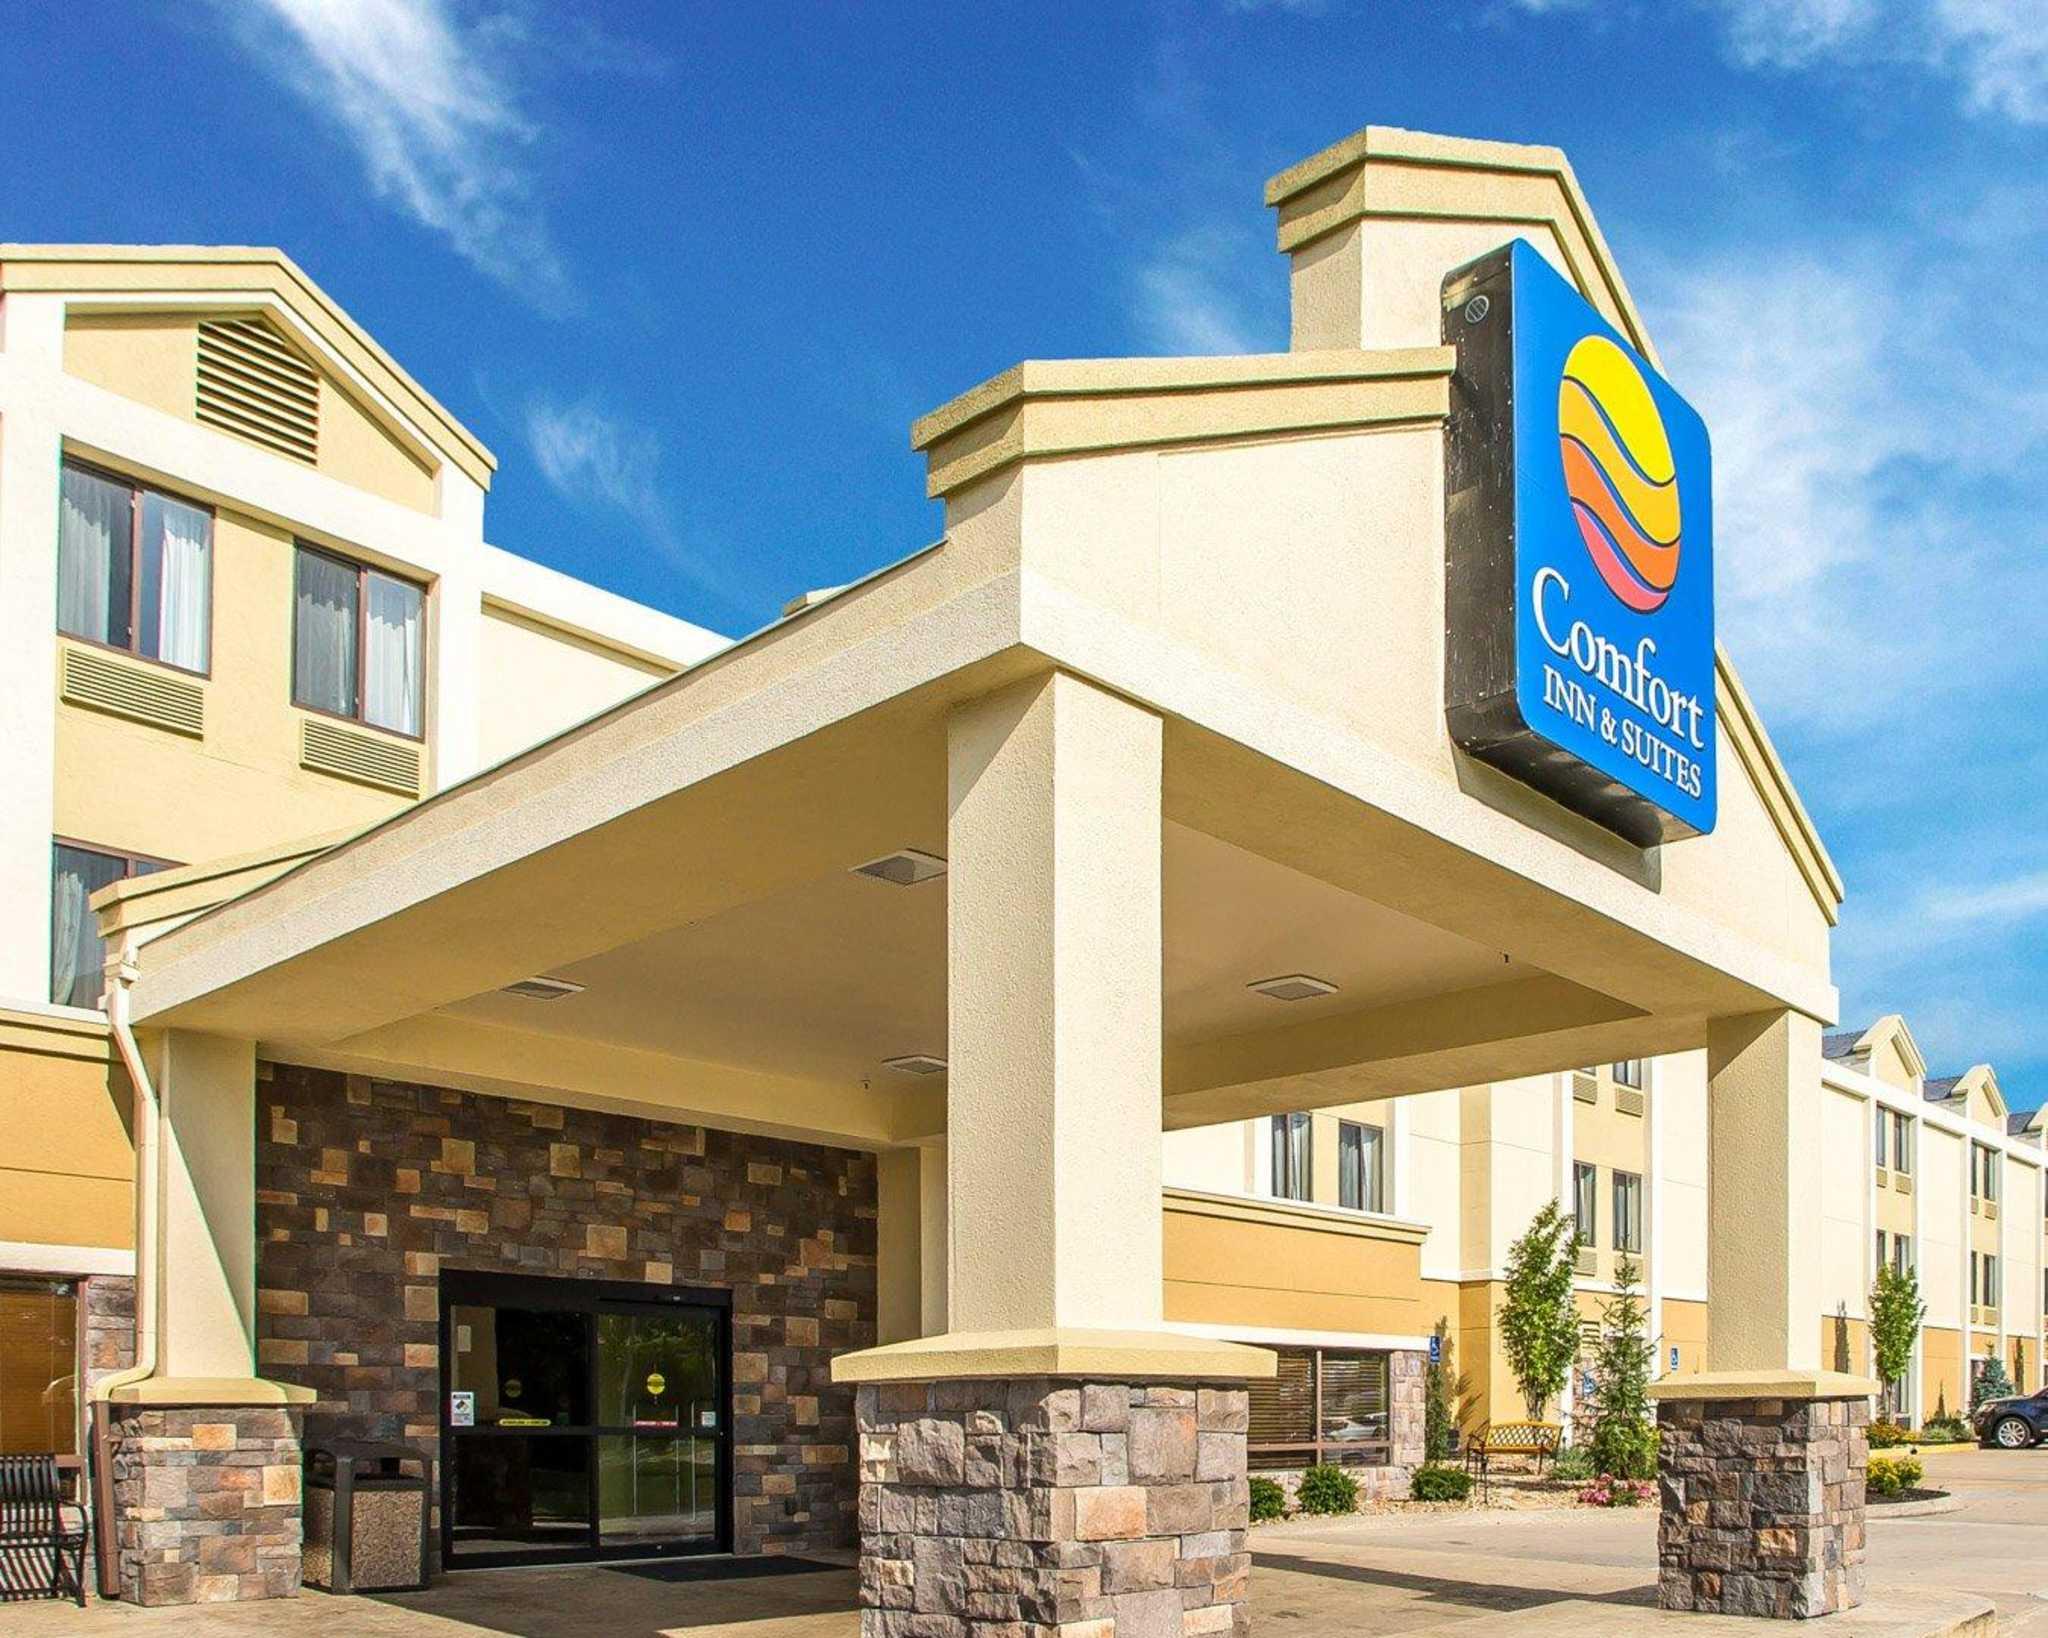 Comfort Inn & Suites Kansas City - Northeast image 0